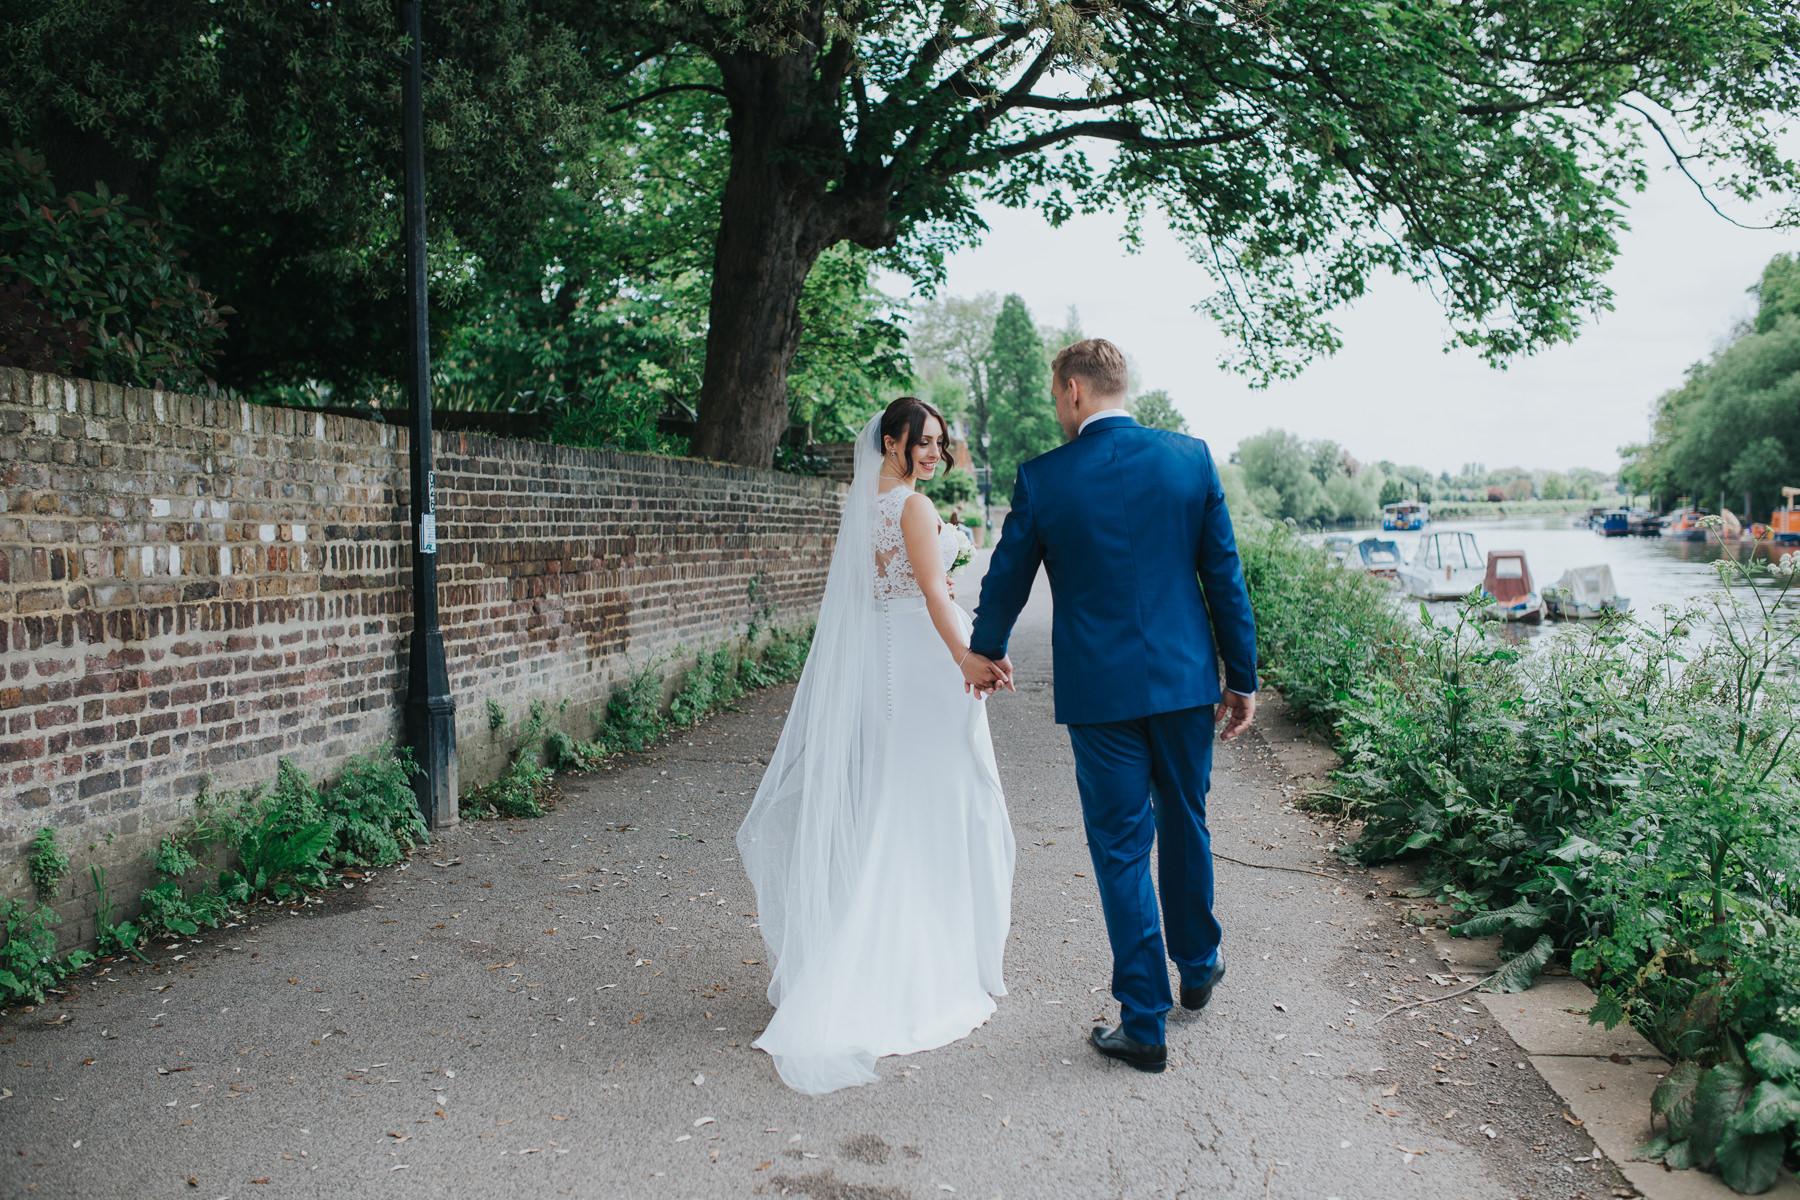 CRL-368-The Bingham wedding Richmond-Claire Rob bridal couple portraits on Thamespath.jpg